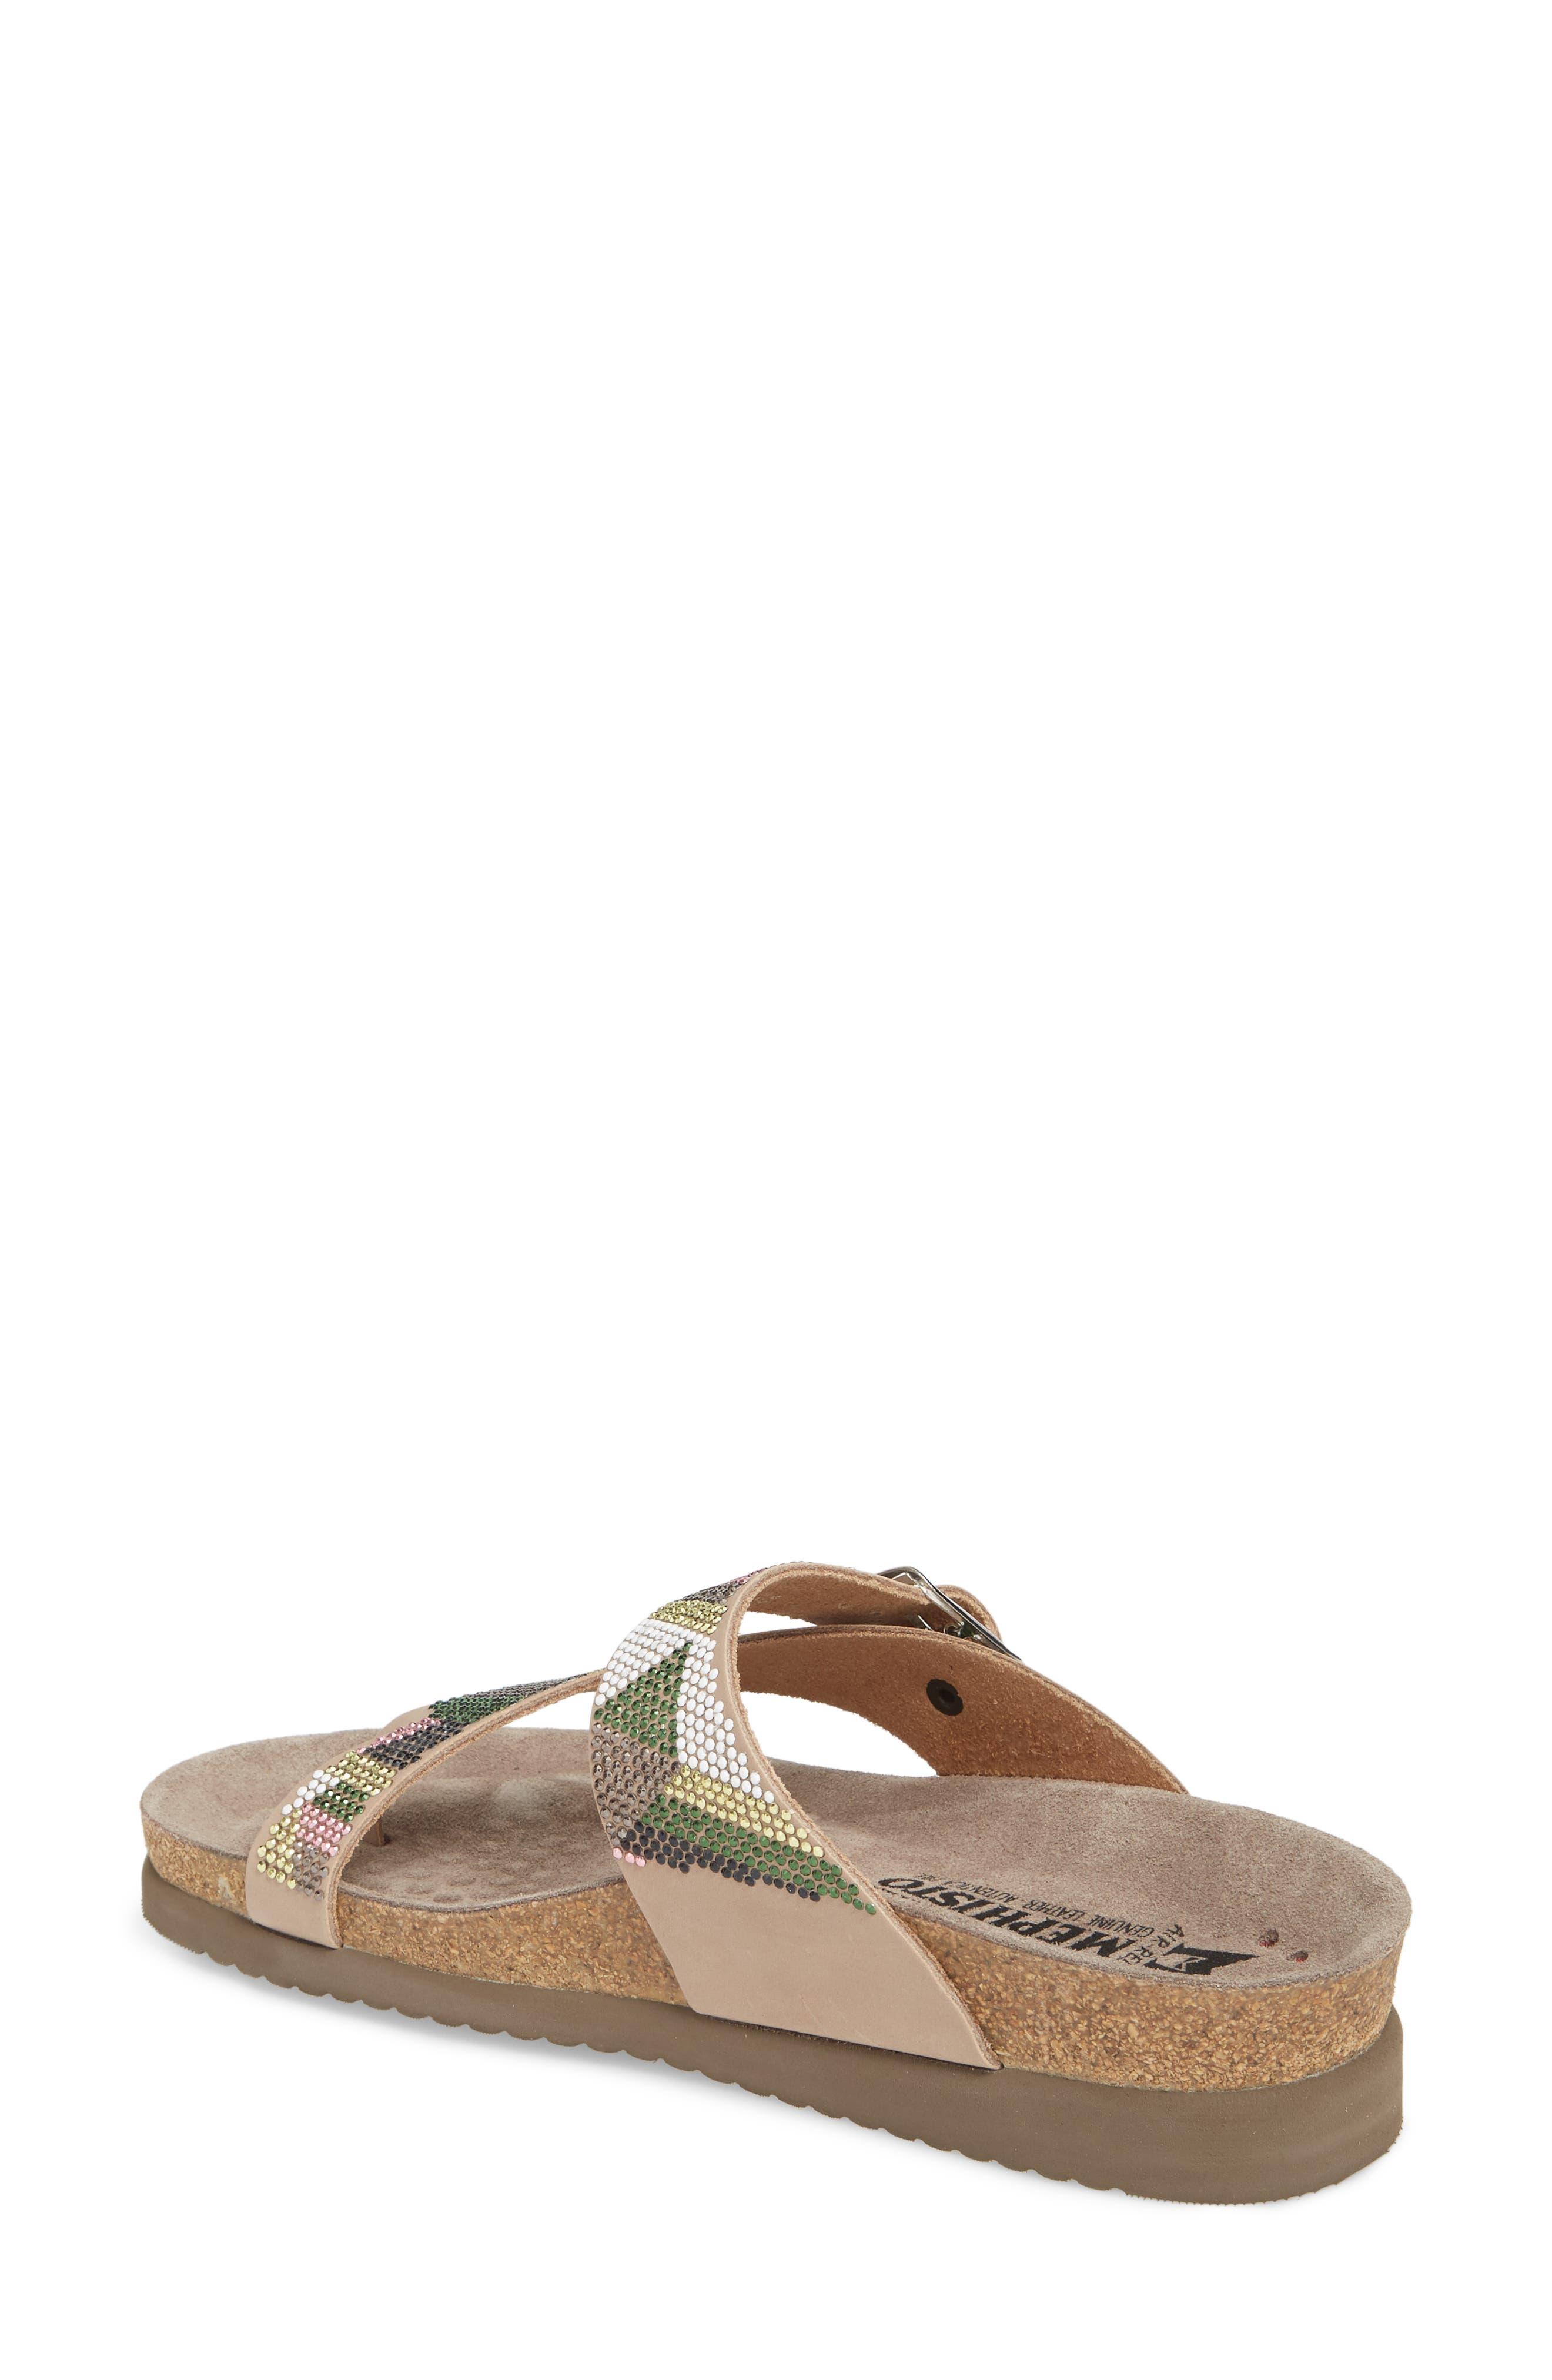 Helen Slide Sandal,                             Alternate thumbnail 2, color,                             Taupe/ Green/ Pink